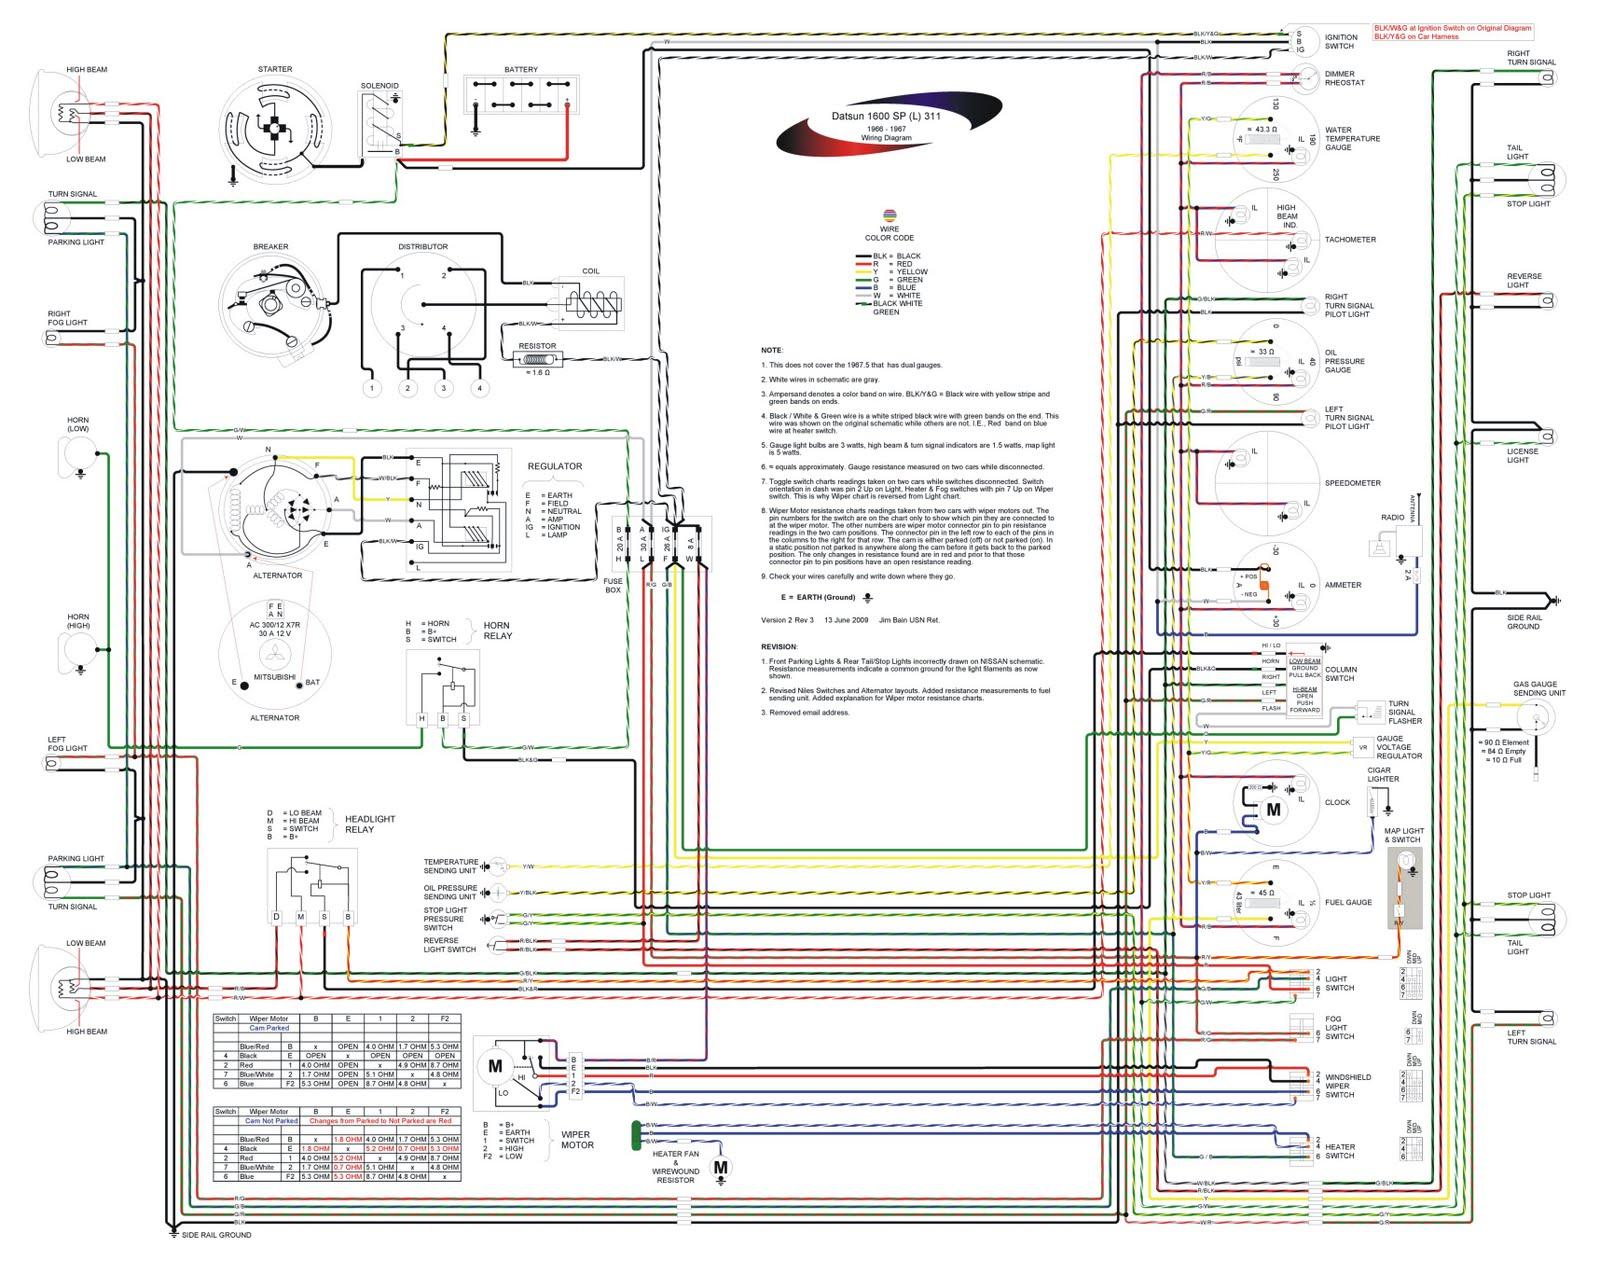 Ammeter Wiring Diagram Alternator Lights V Manual 1966 1967 Datsun 1600 Sports Wiring Schematic